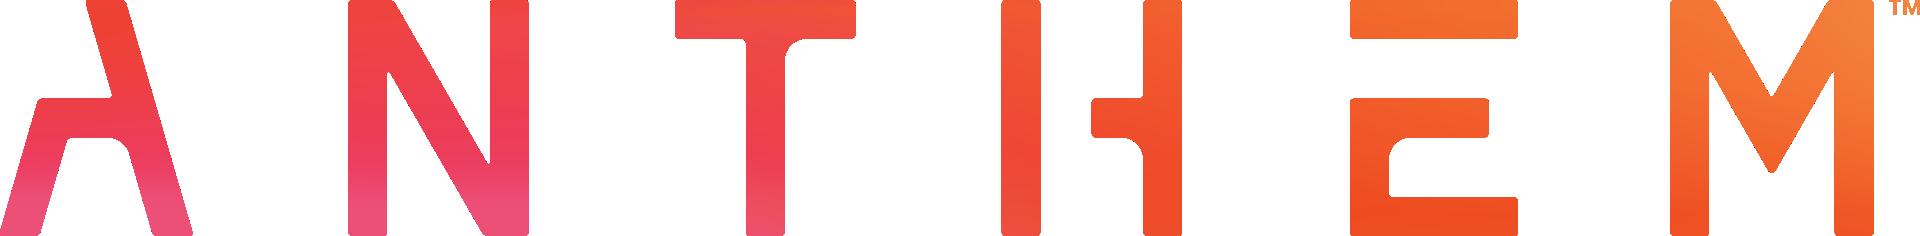 The Anthem Logo Teaches Us Good Logo Design Bmb